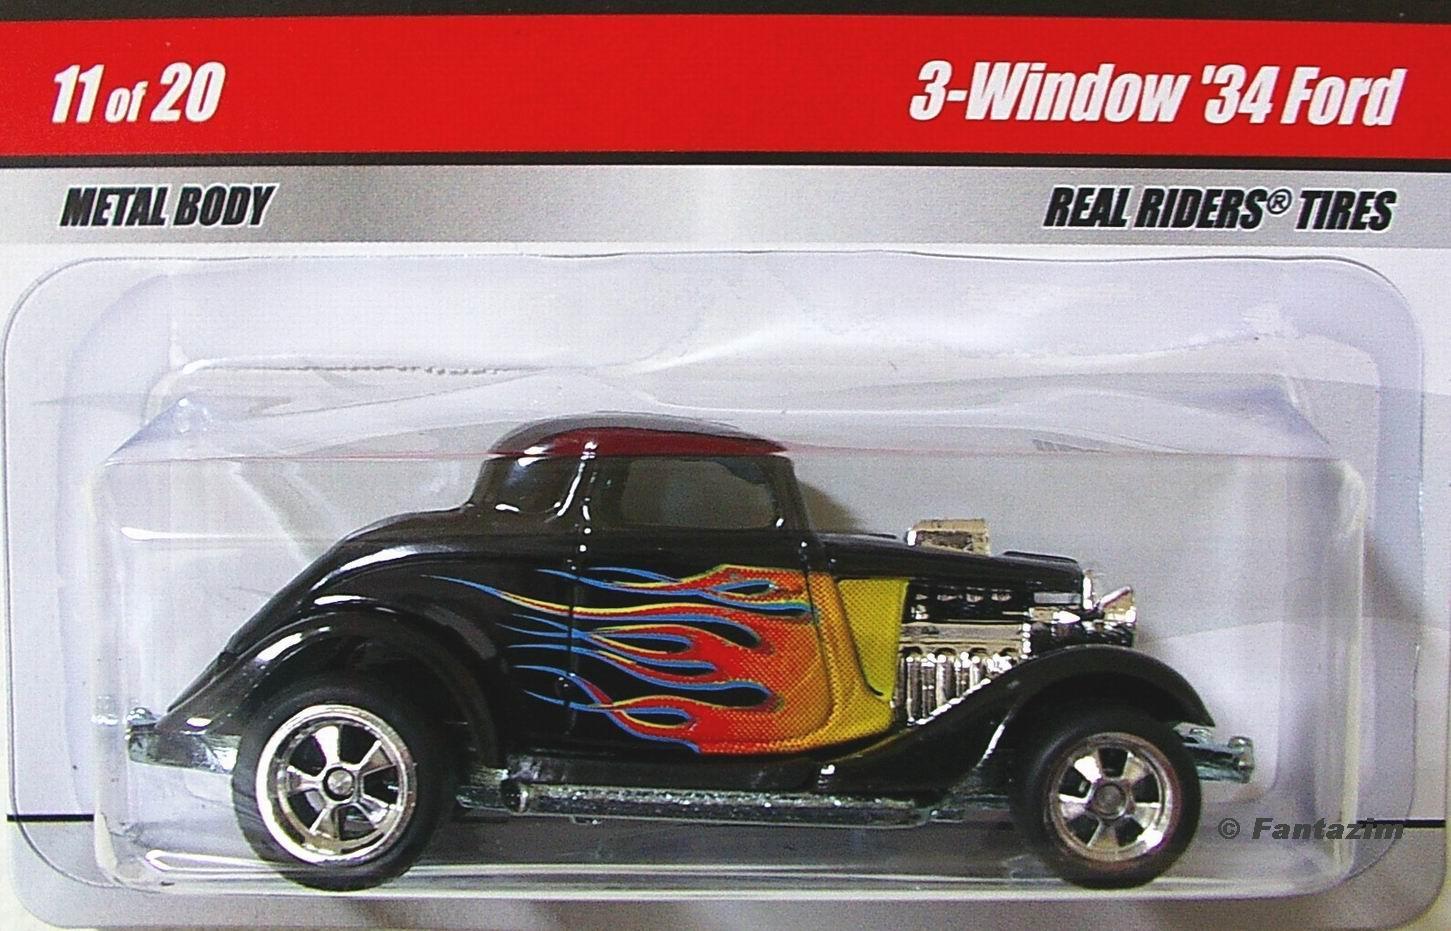 3-Window '34